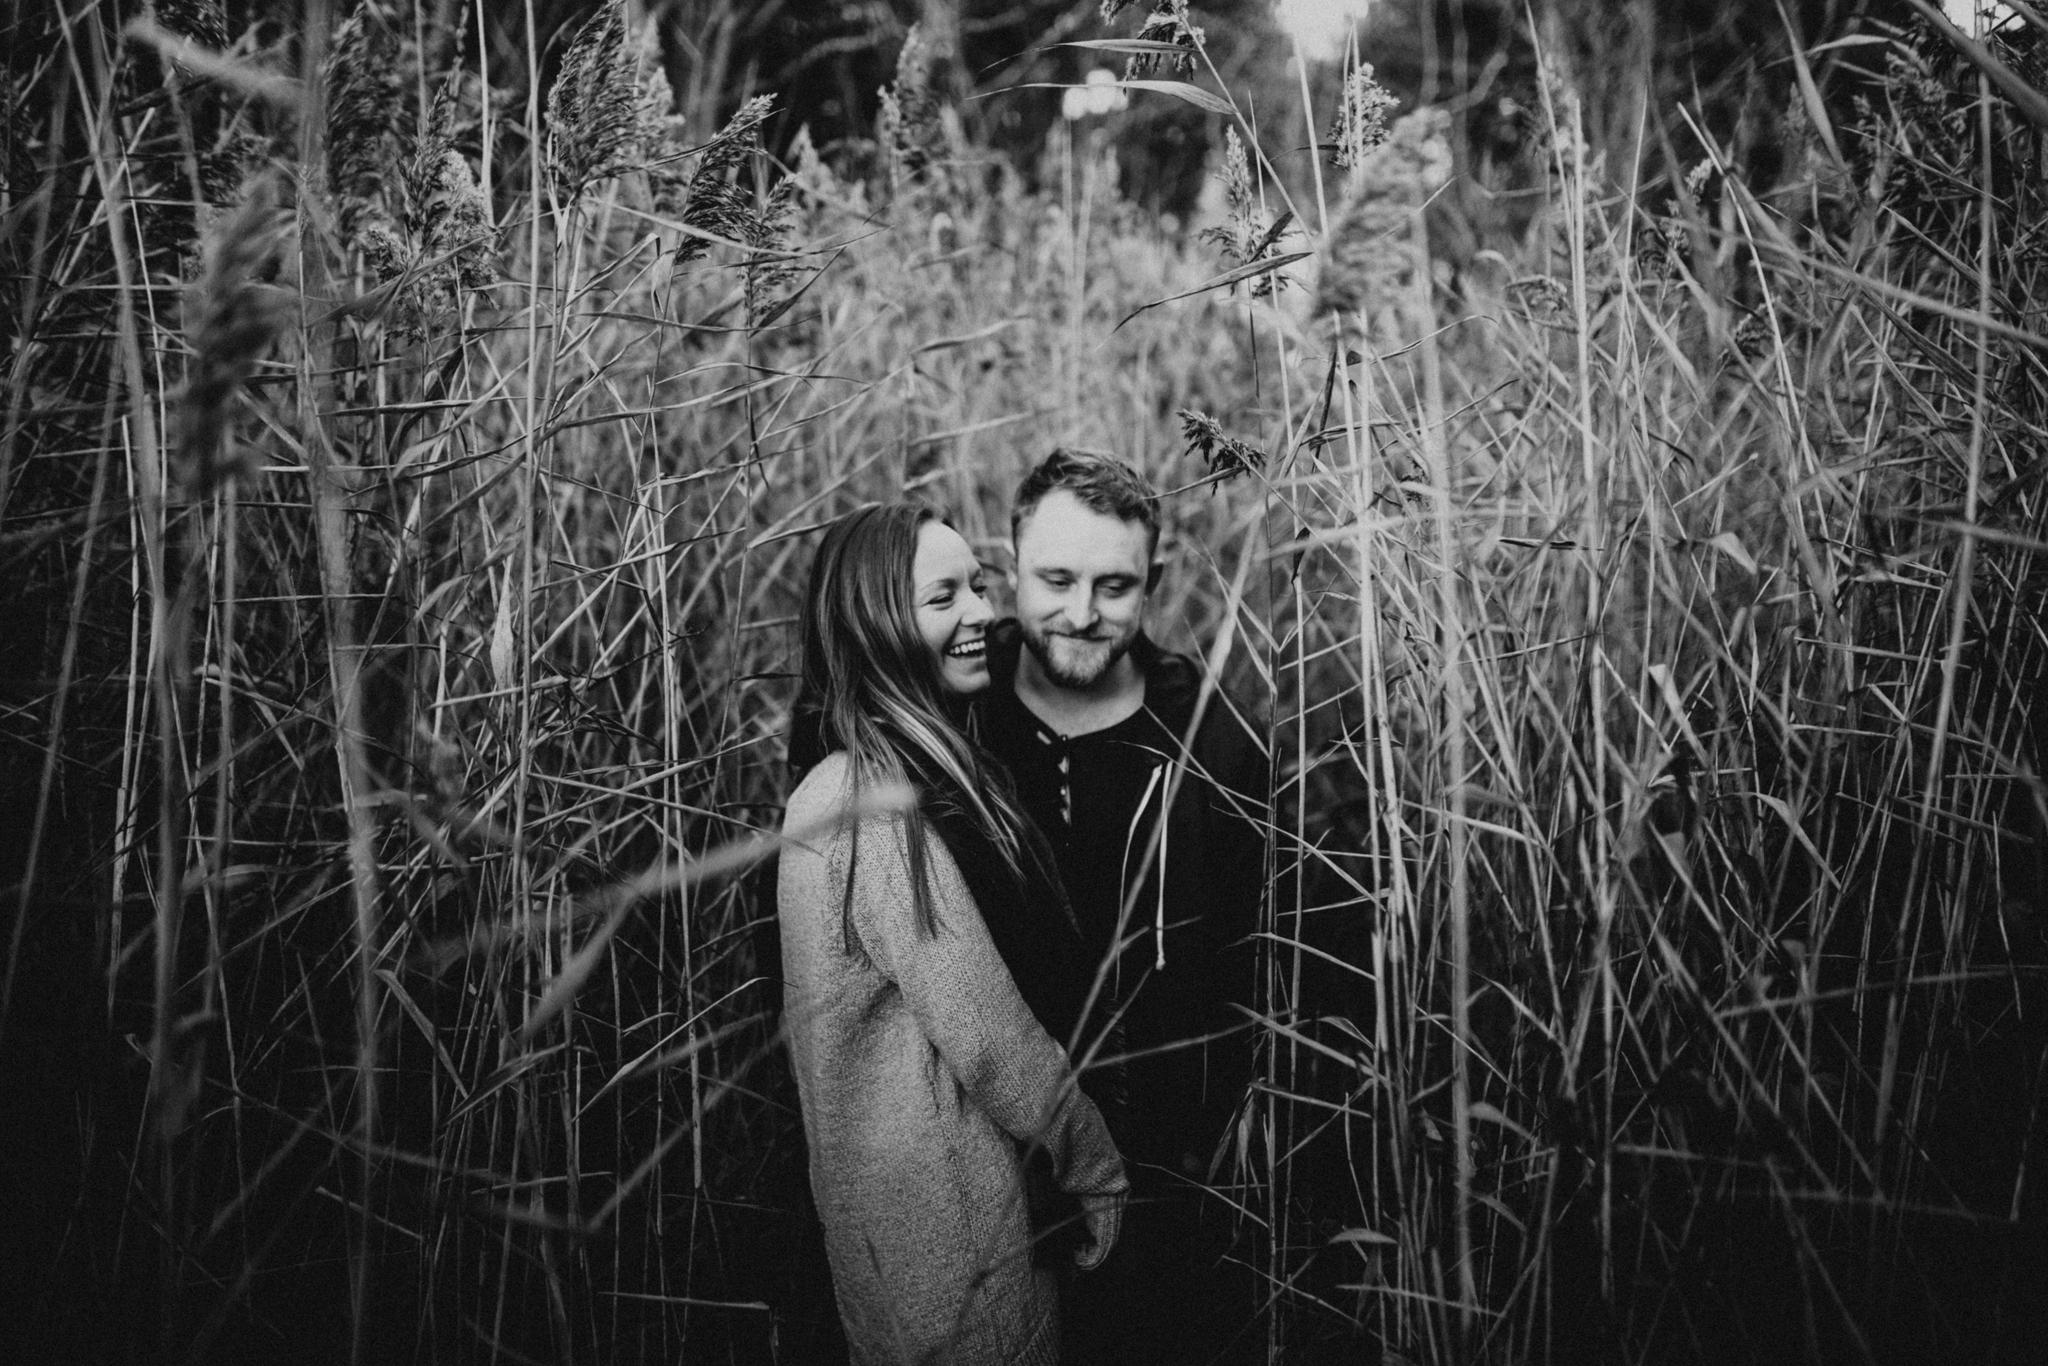 Luke-Mary-Engagement-Adventure-Session-Norfolk-Photography-Photographer-Darina-Stoda-71.jpg